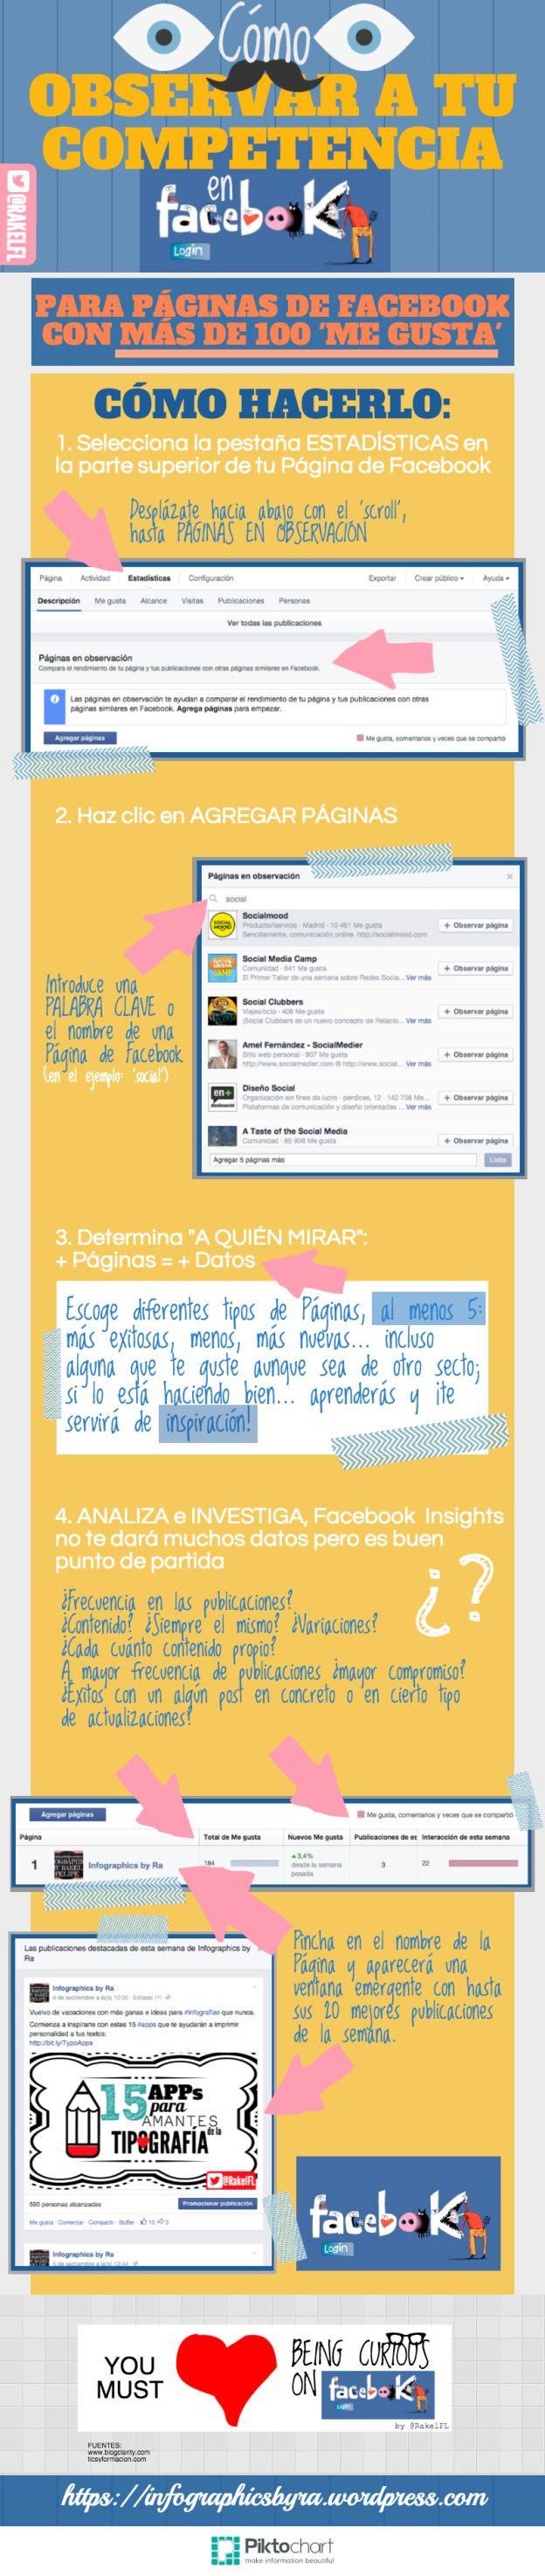 Cómo observar a tu competencia en FaceBook. #infografia